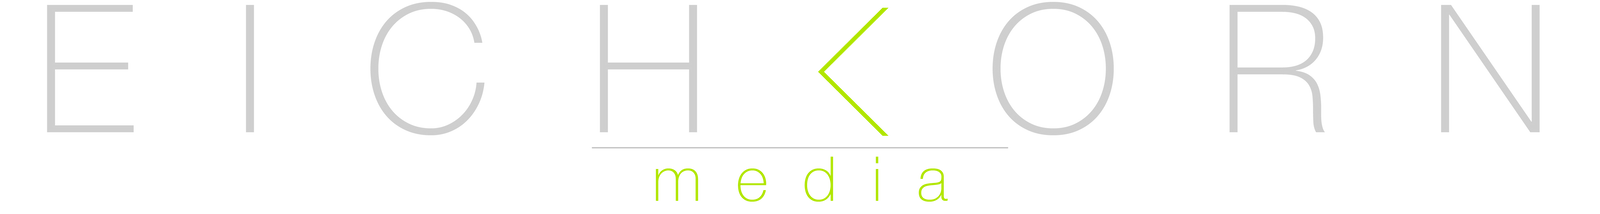 WortmarkeAllVersions media 75 by EICHKORN-media